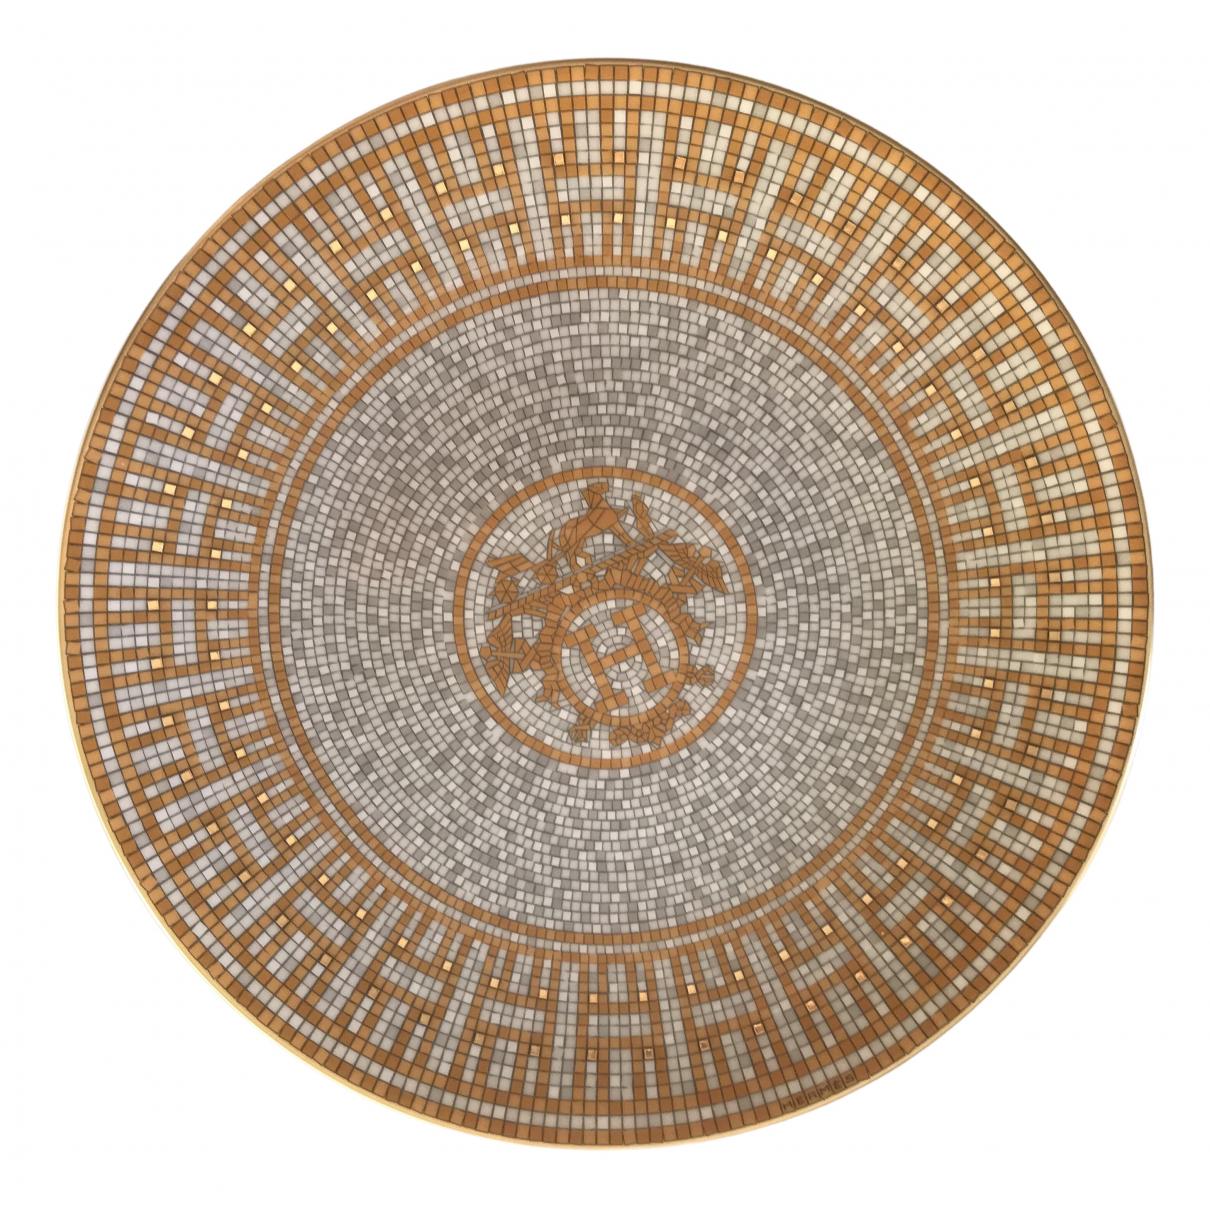 Hermes Mosaique au 24 Tischkultur in Porzellan